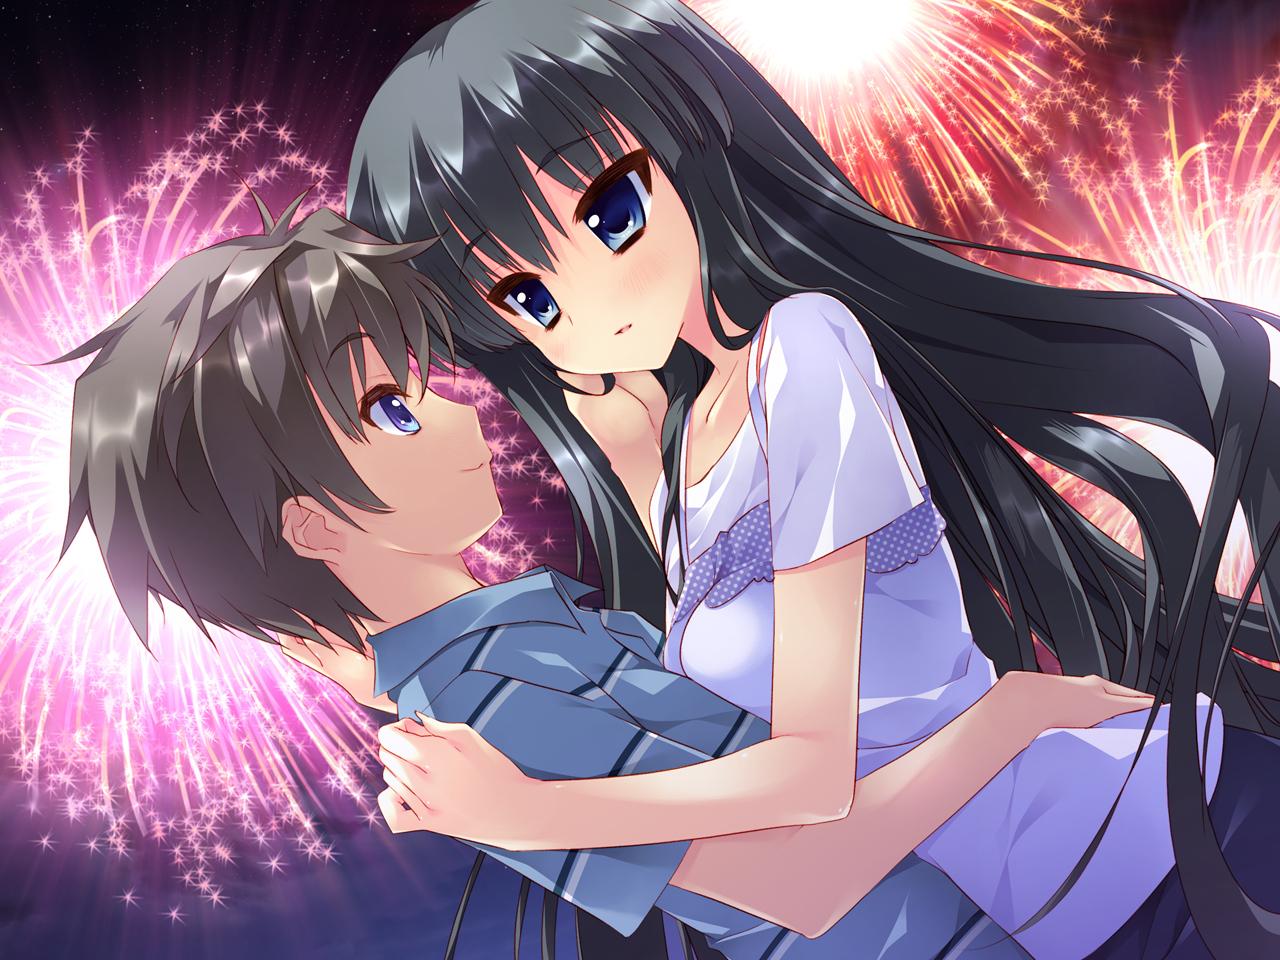 black_hair blue_eyes feng fireworks game_cg hoshizora_e_kakaru_hashi hoshizora_e_kakaru_hashi_aa long_hair night yorozu_senka